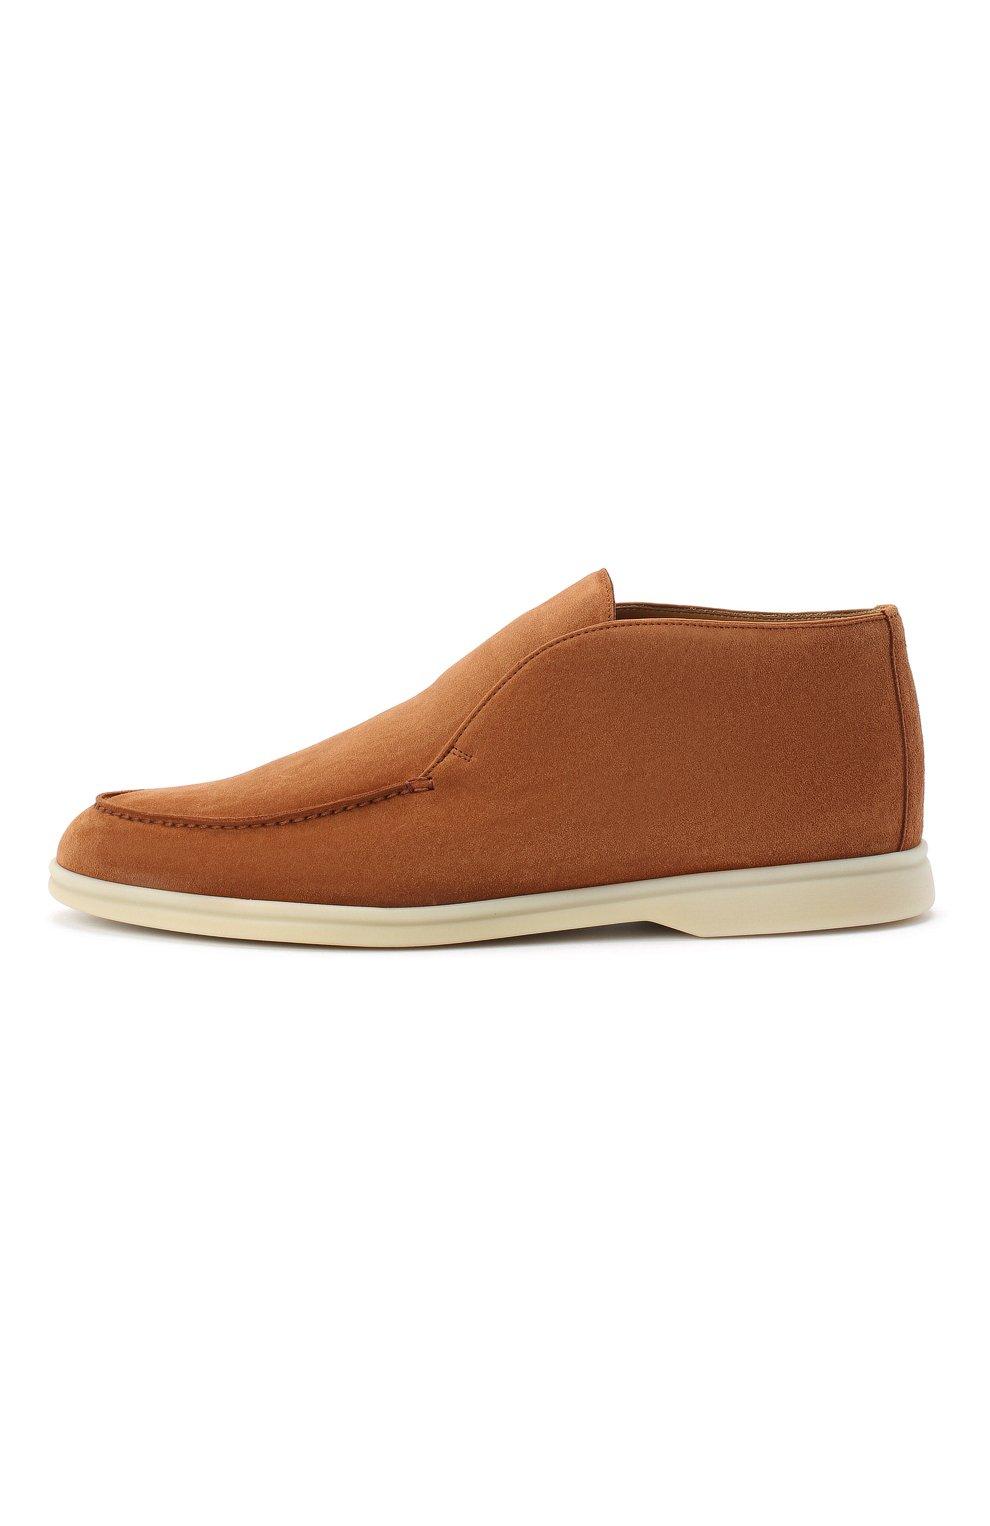 Мужские замшевые ботинки open walk LORO PIANA светло-коричневого цвета, арт. FAB4368   Фото 3